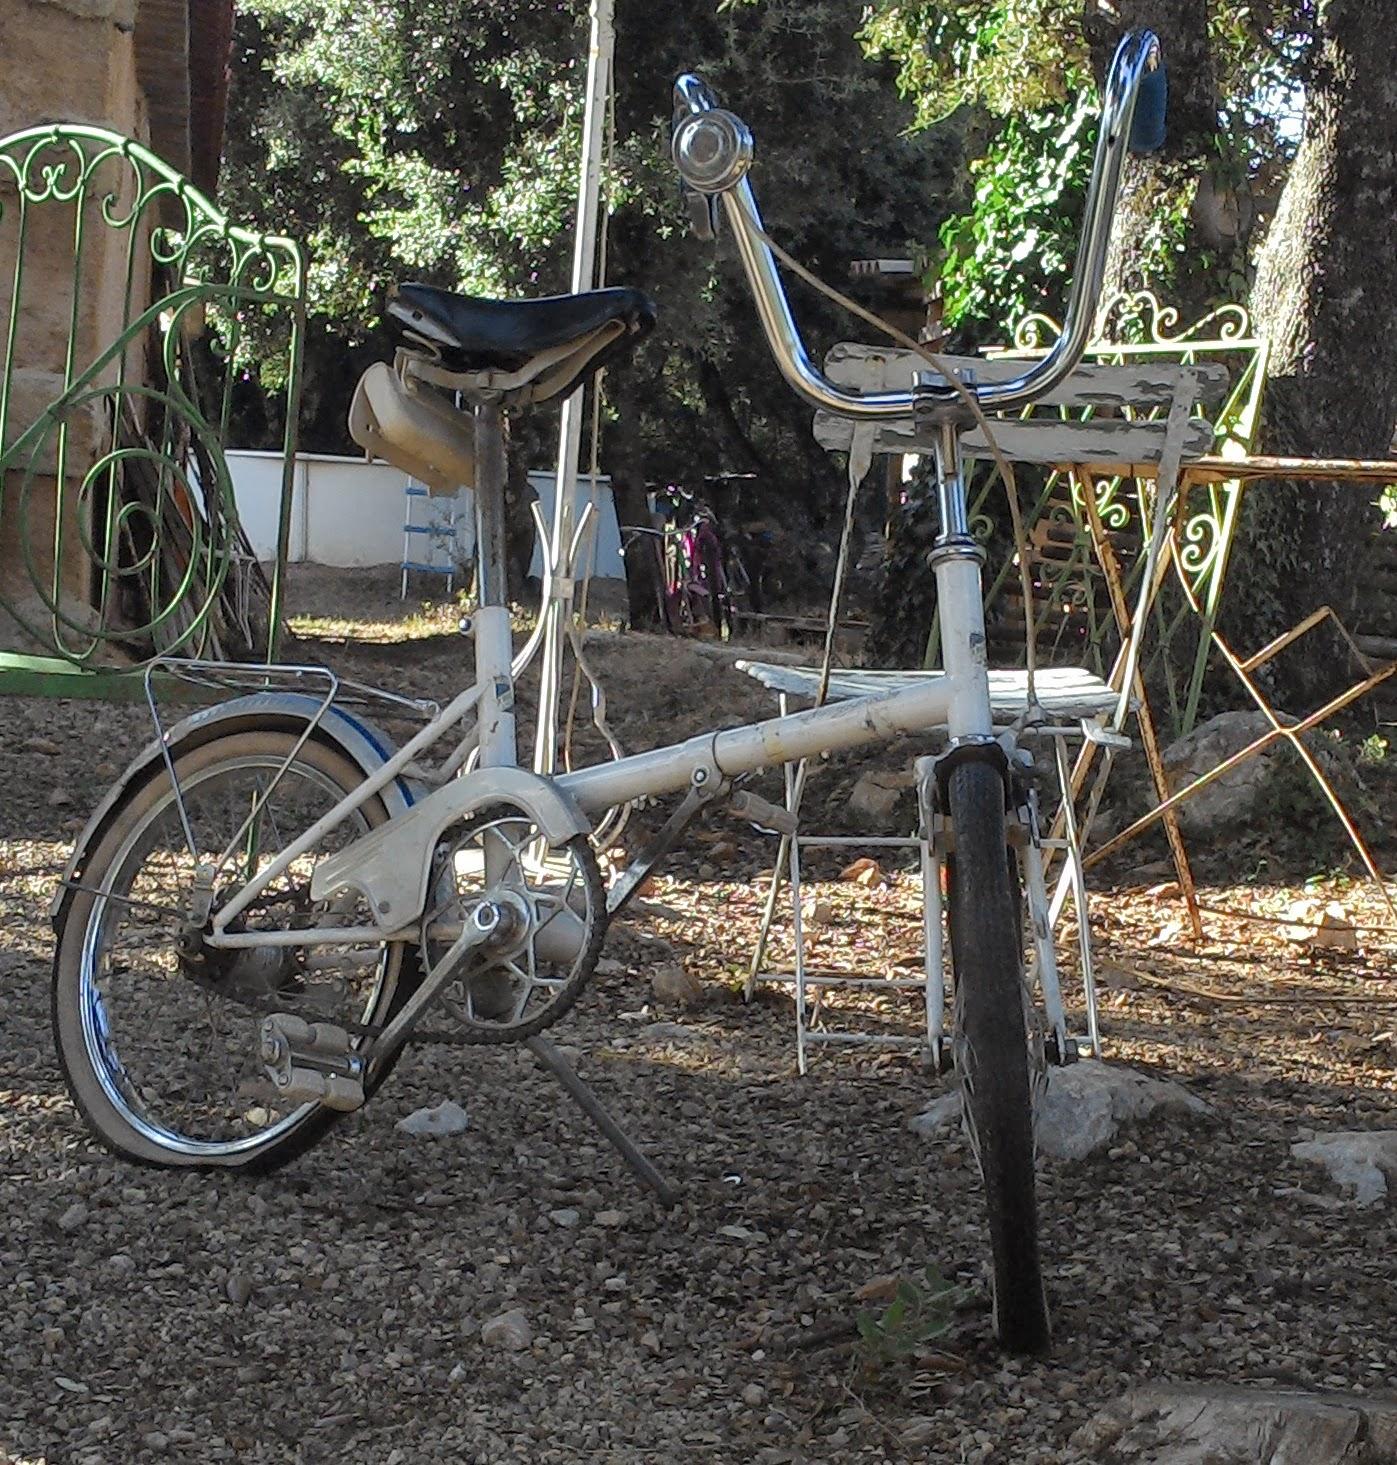 ancien mini v lo pliant pliable vintage chopper seventies 70 39 s french bike ebay. Black Bedroom Furniture Sets. Home Design Ideas